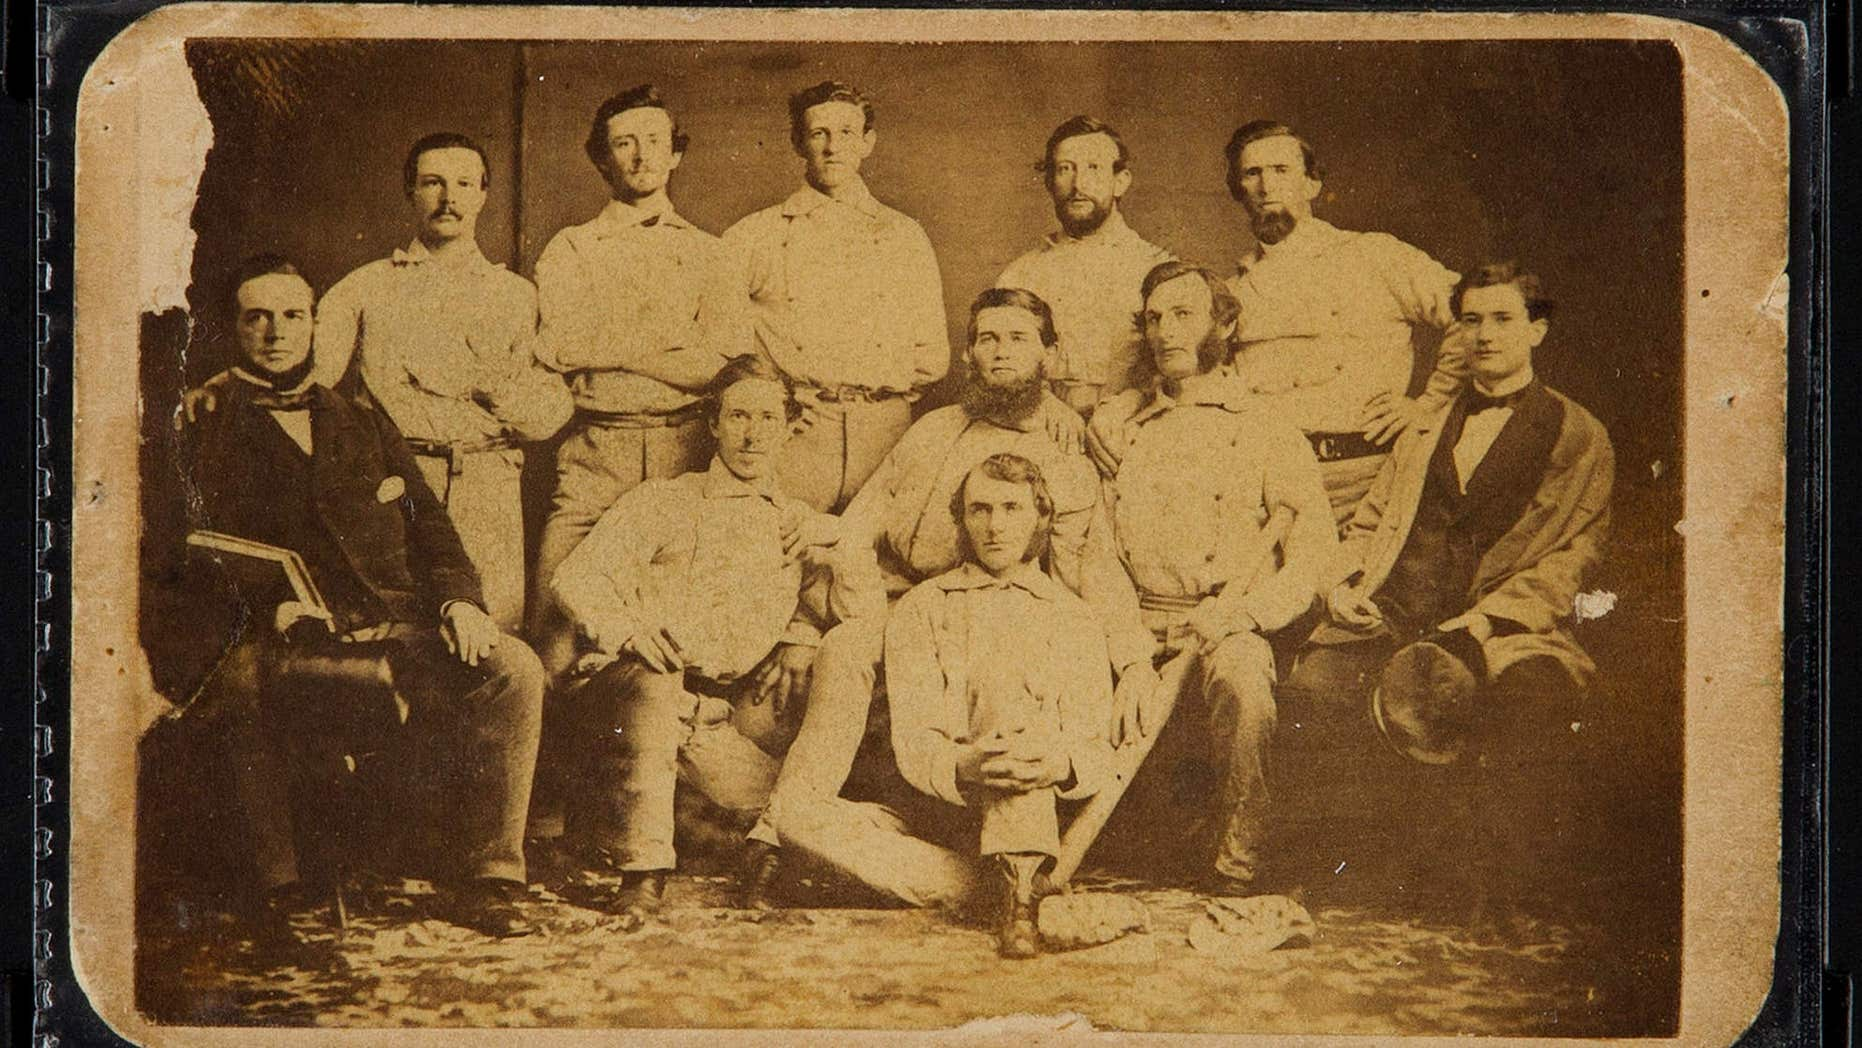 Vintage Pre Civil War Baseball Card Sells For 179g At